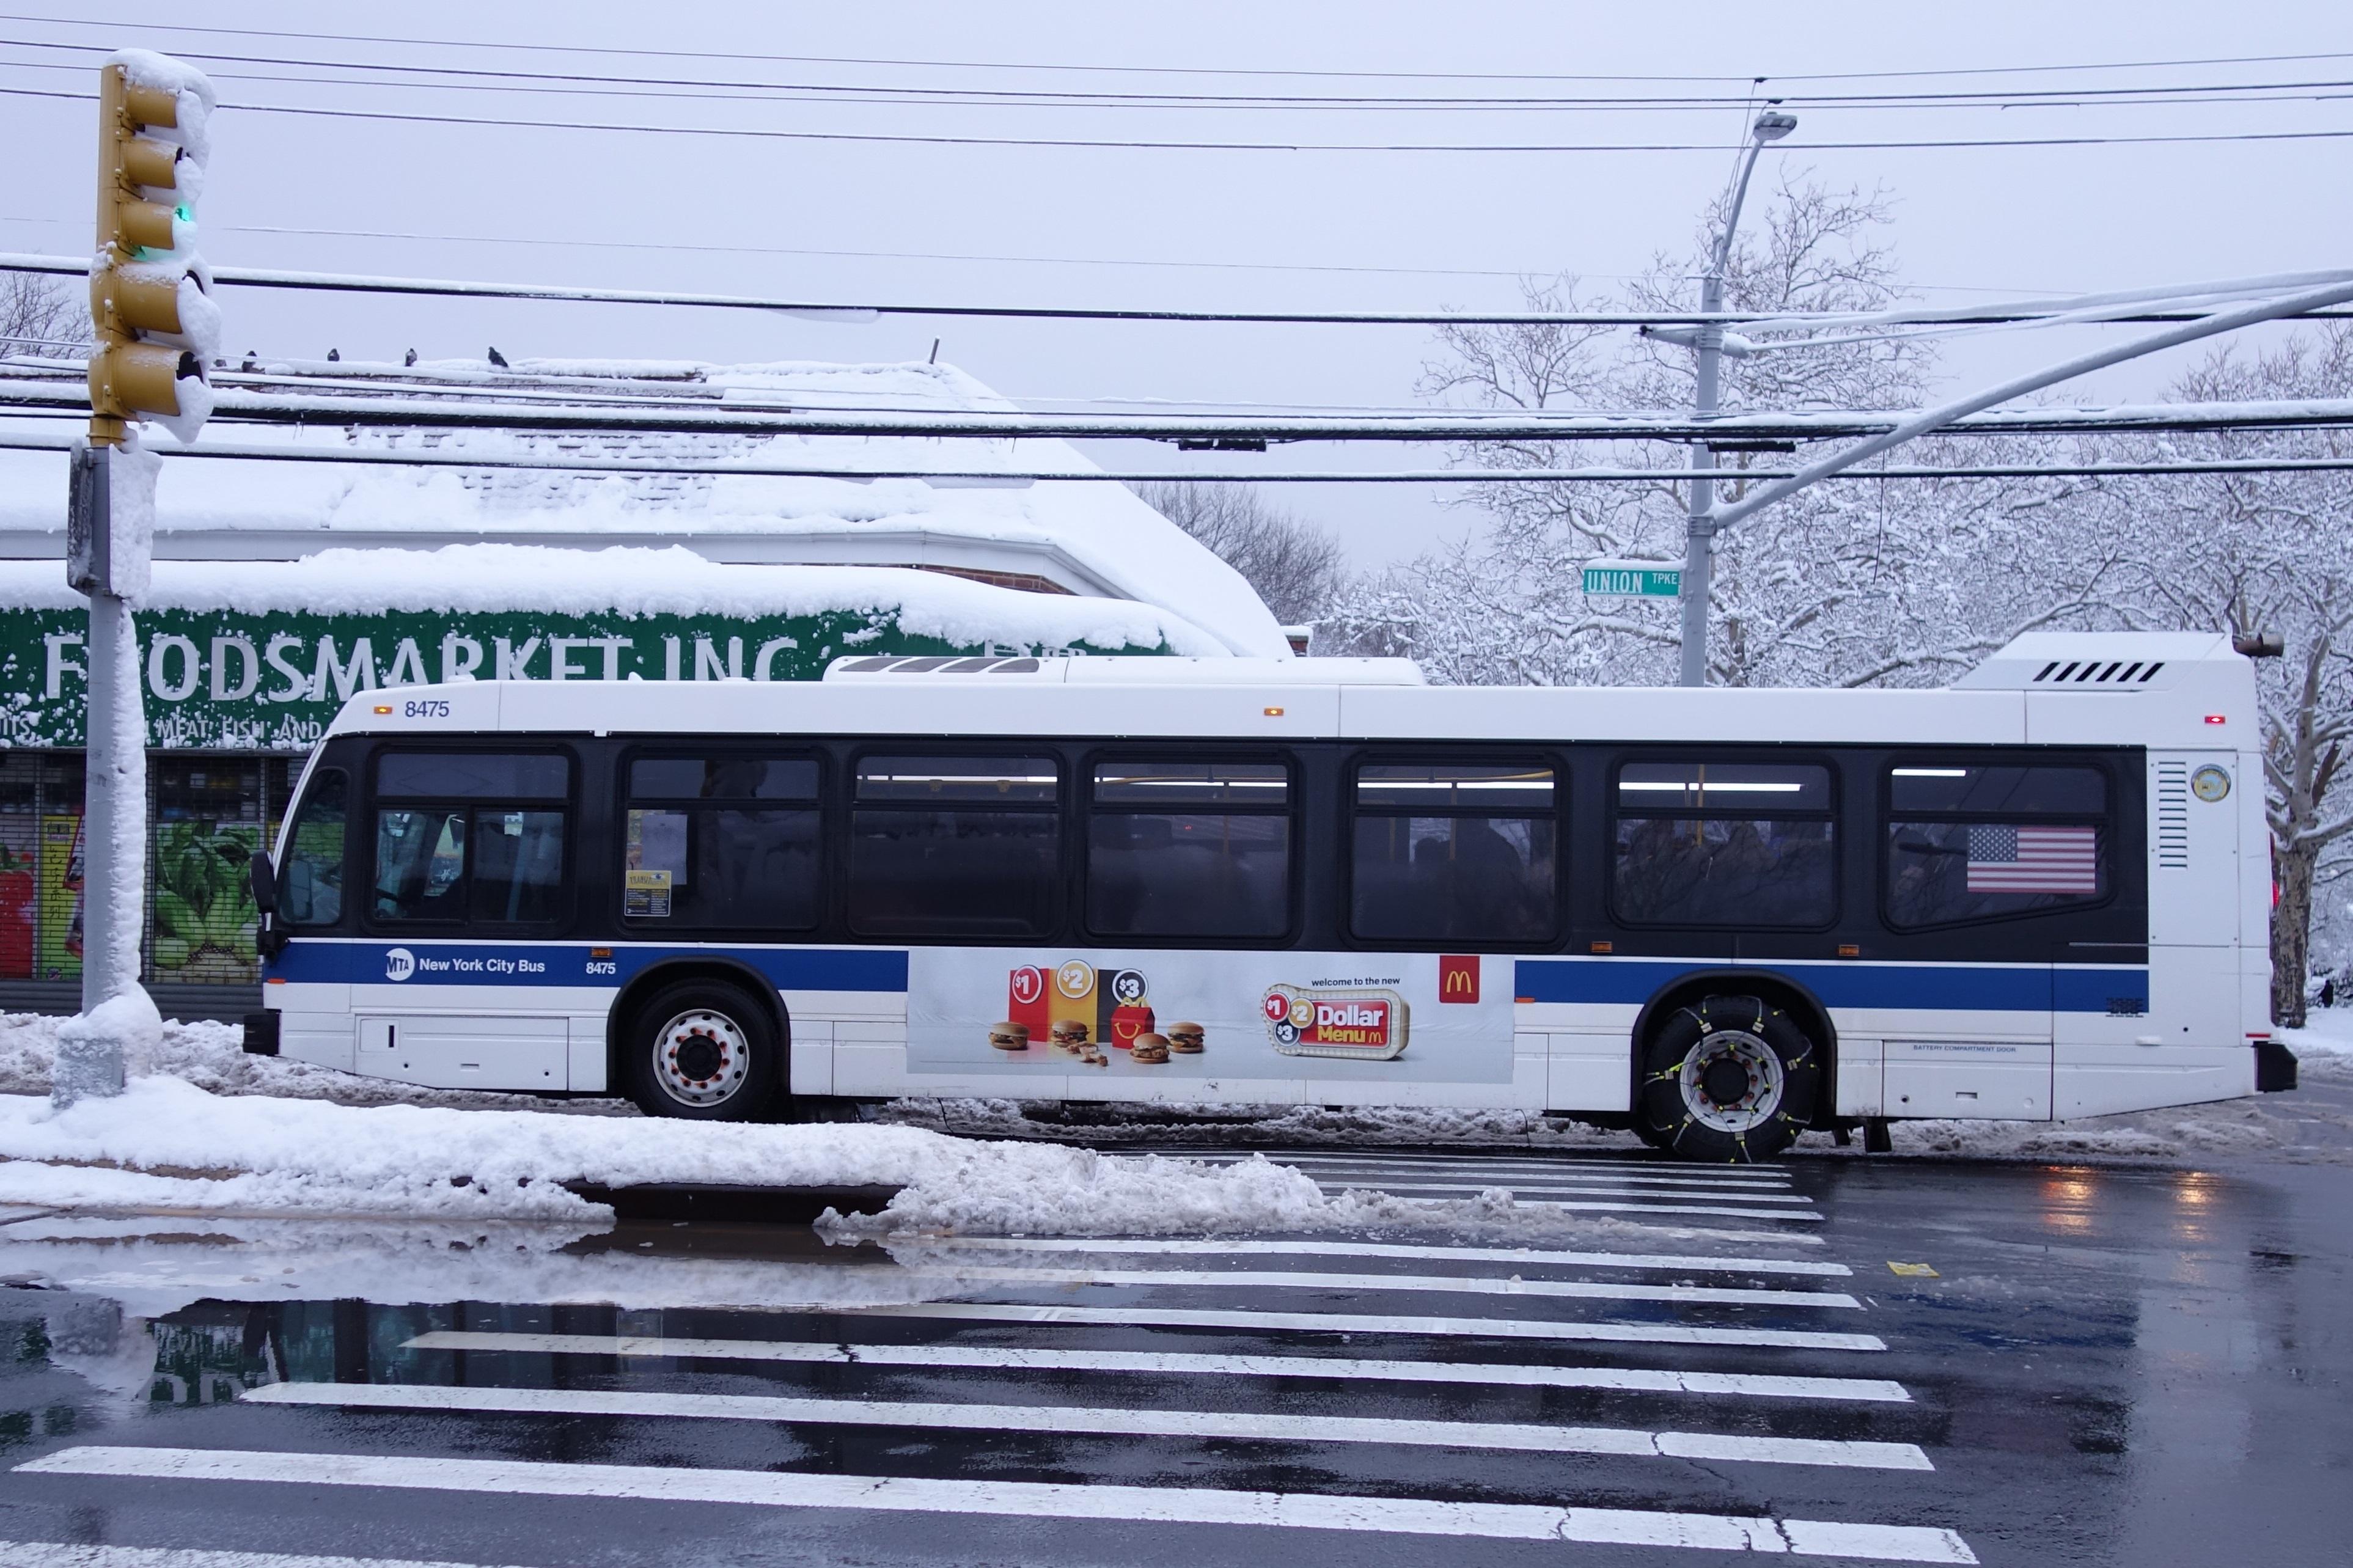 File:MTA Union Tpke 168 St 37.jpg - Wikimedia Commons on